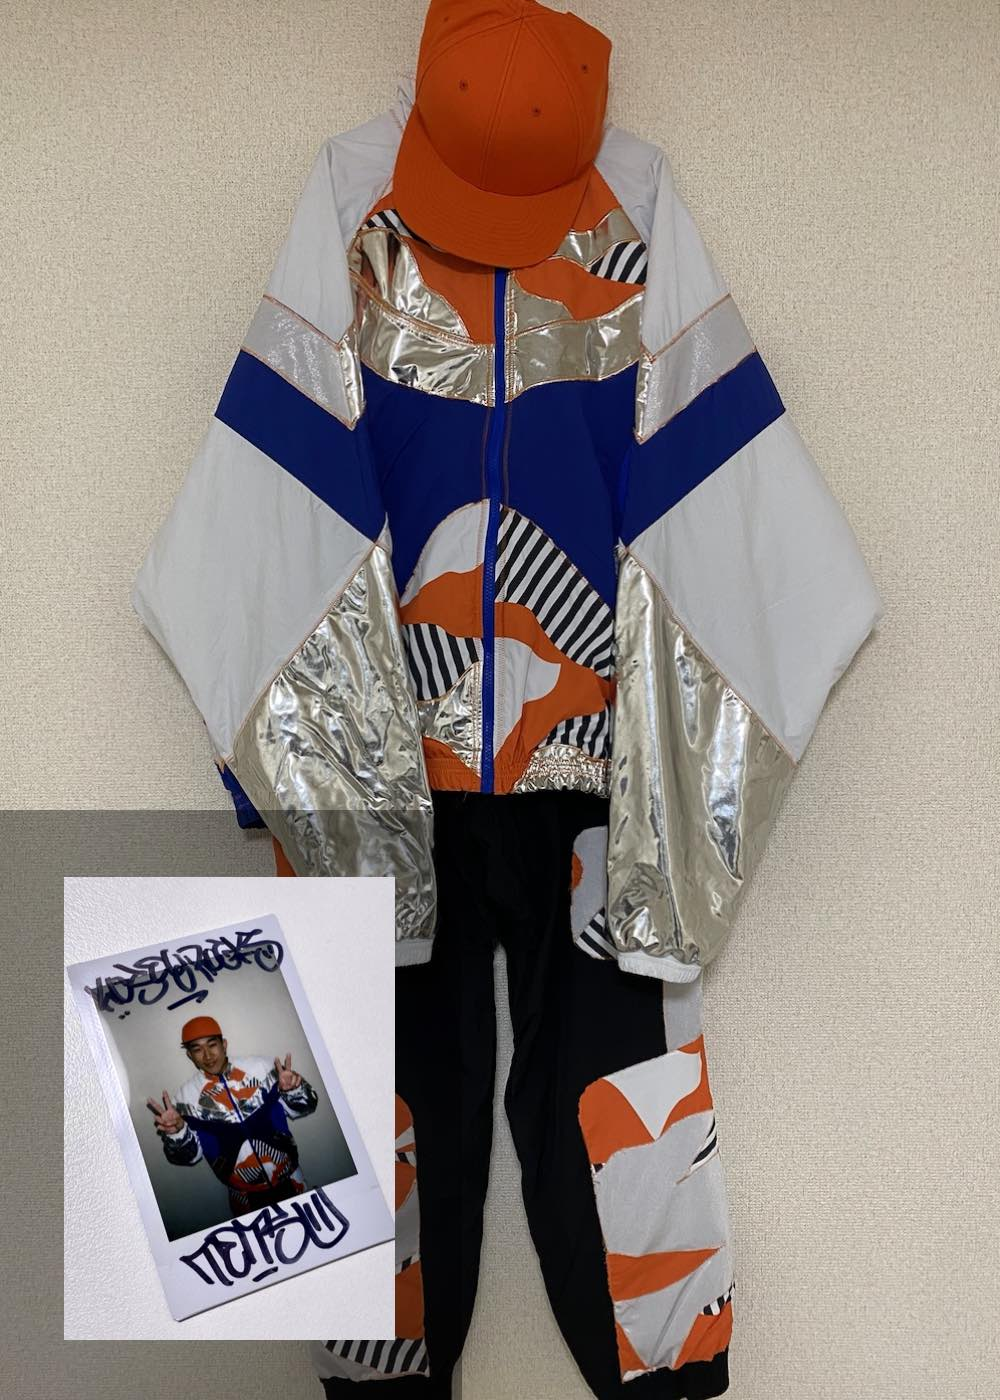 【TETSU】「Semi Final 2nd Match 衣装(上下)+キャップ+サイン入りチェキ」